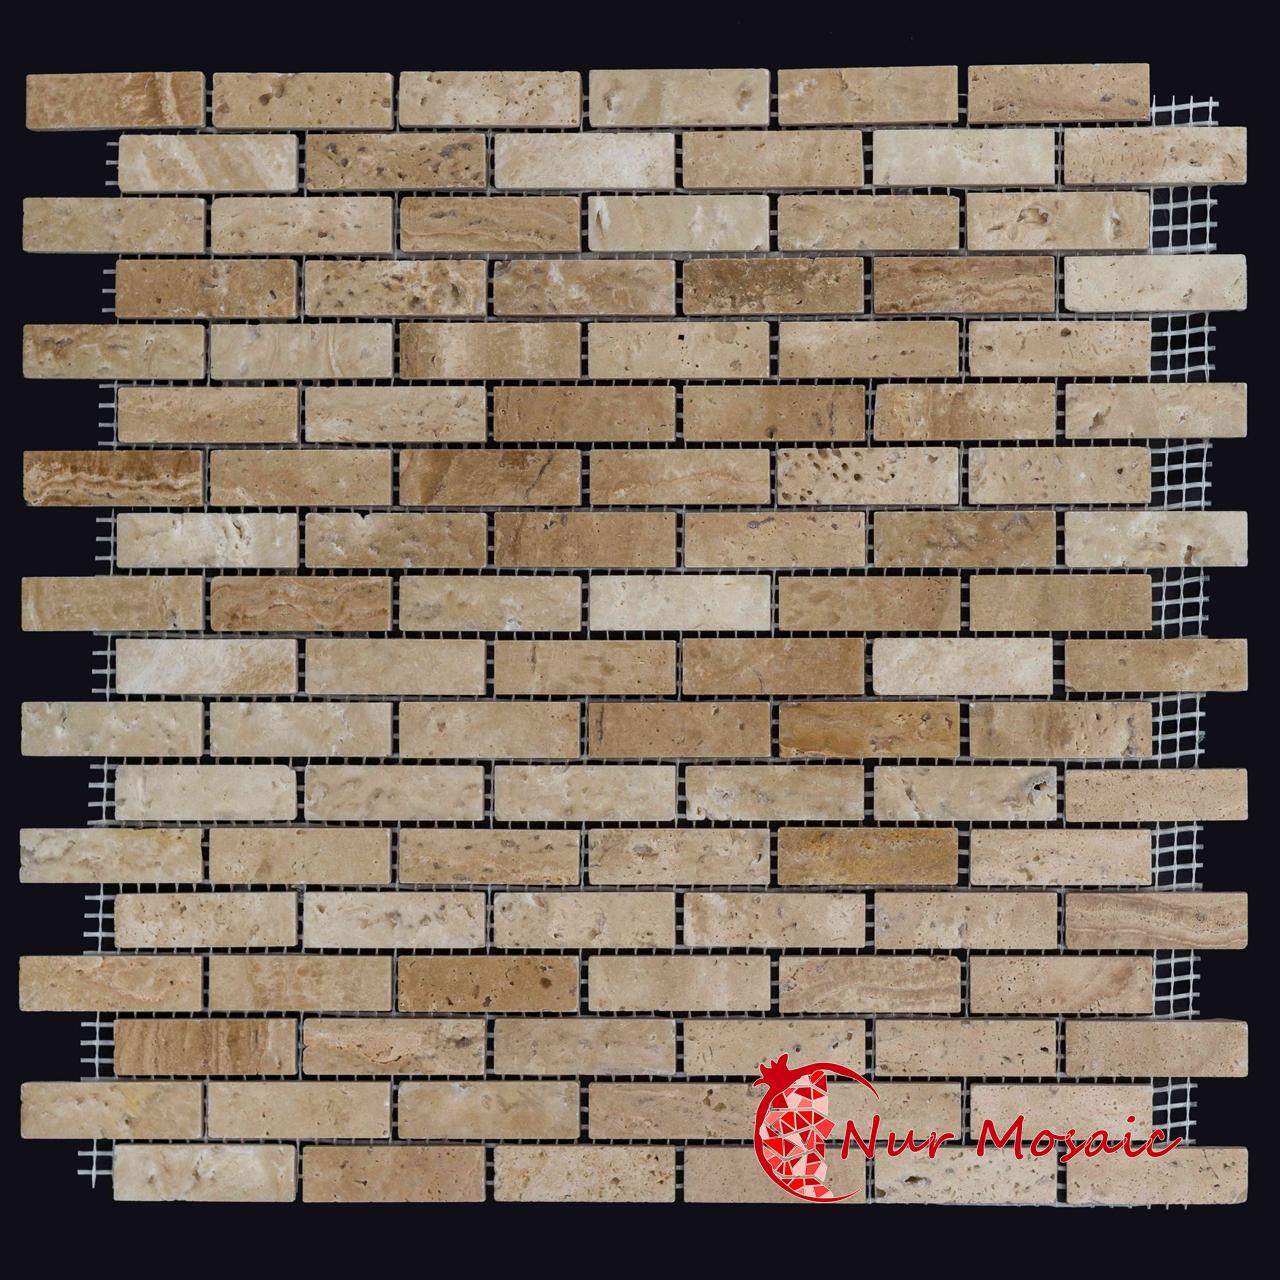 Travertine Brick Mosaic Tile Light Beige Nurmosaic